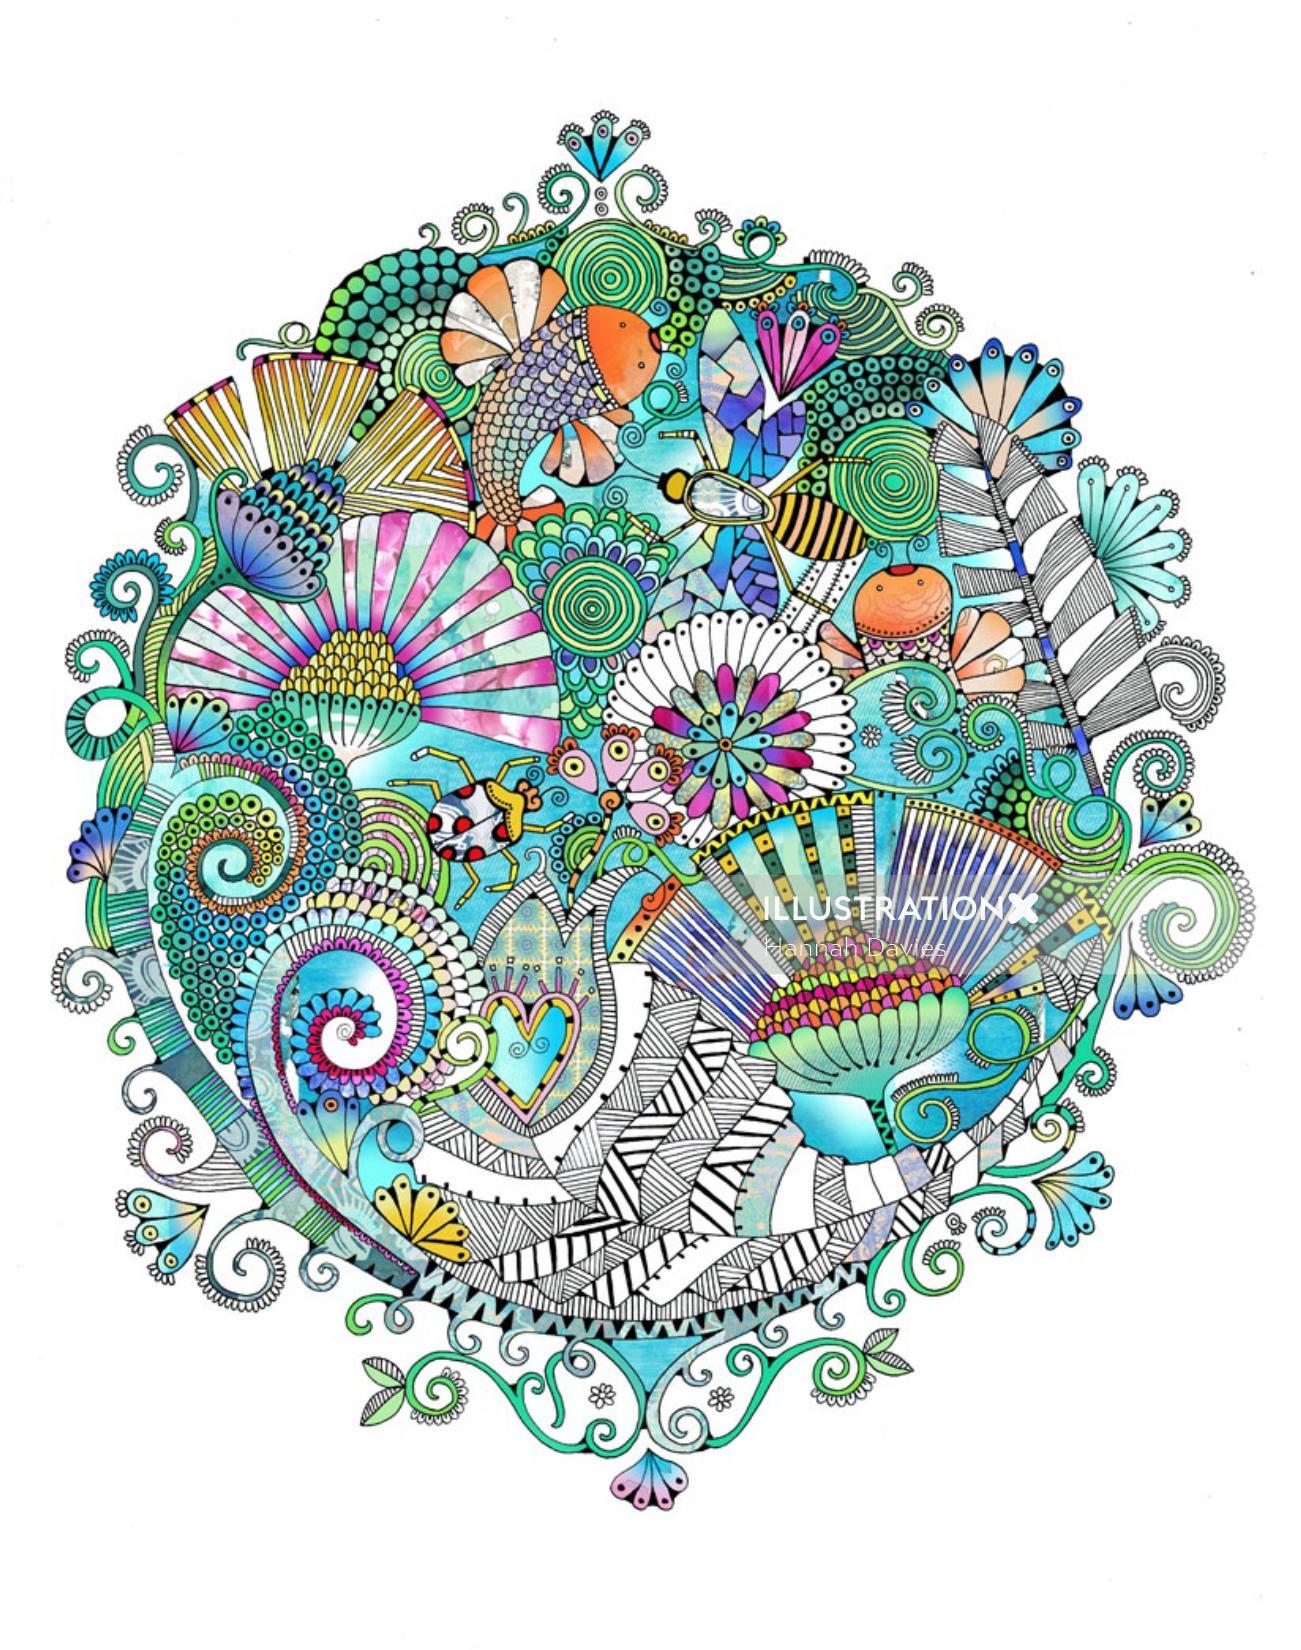 Decorative illustration by Hannah Davies